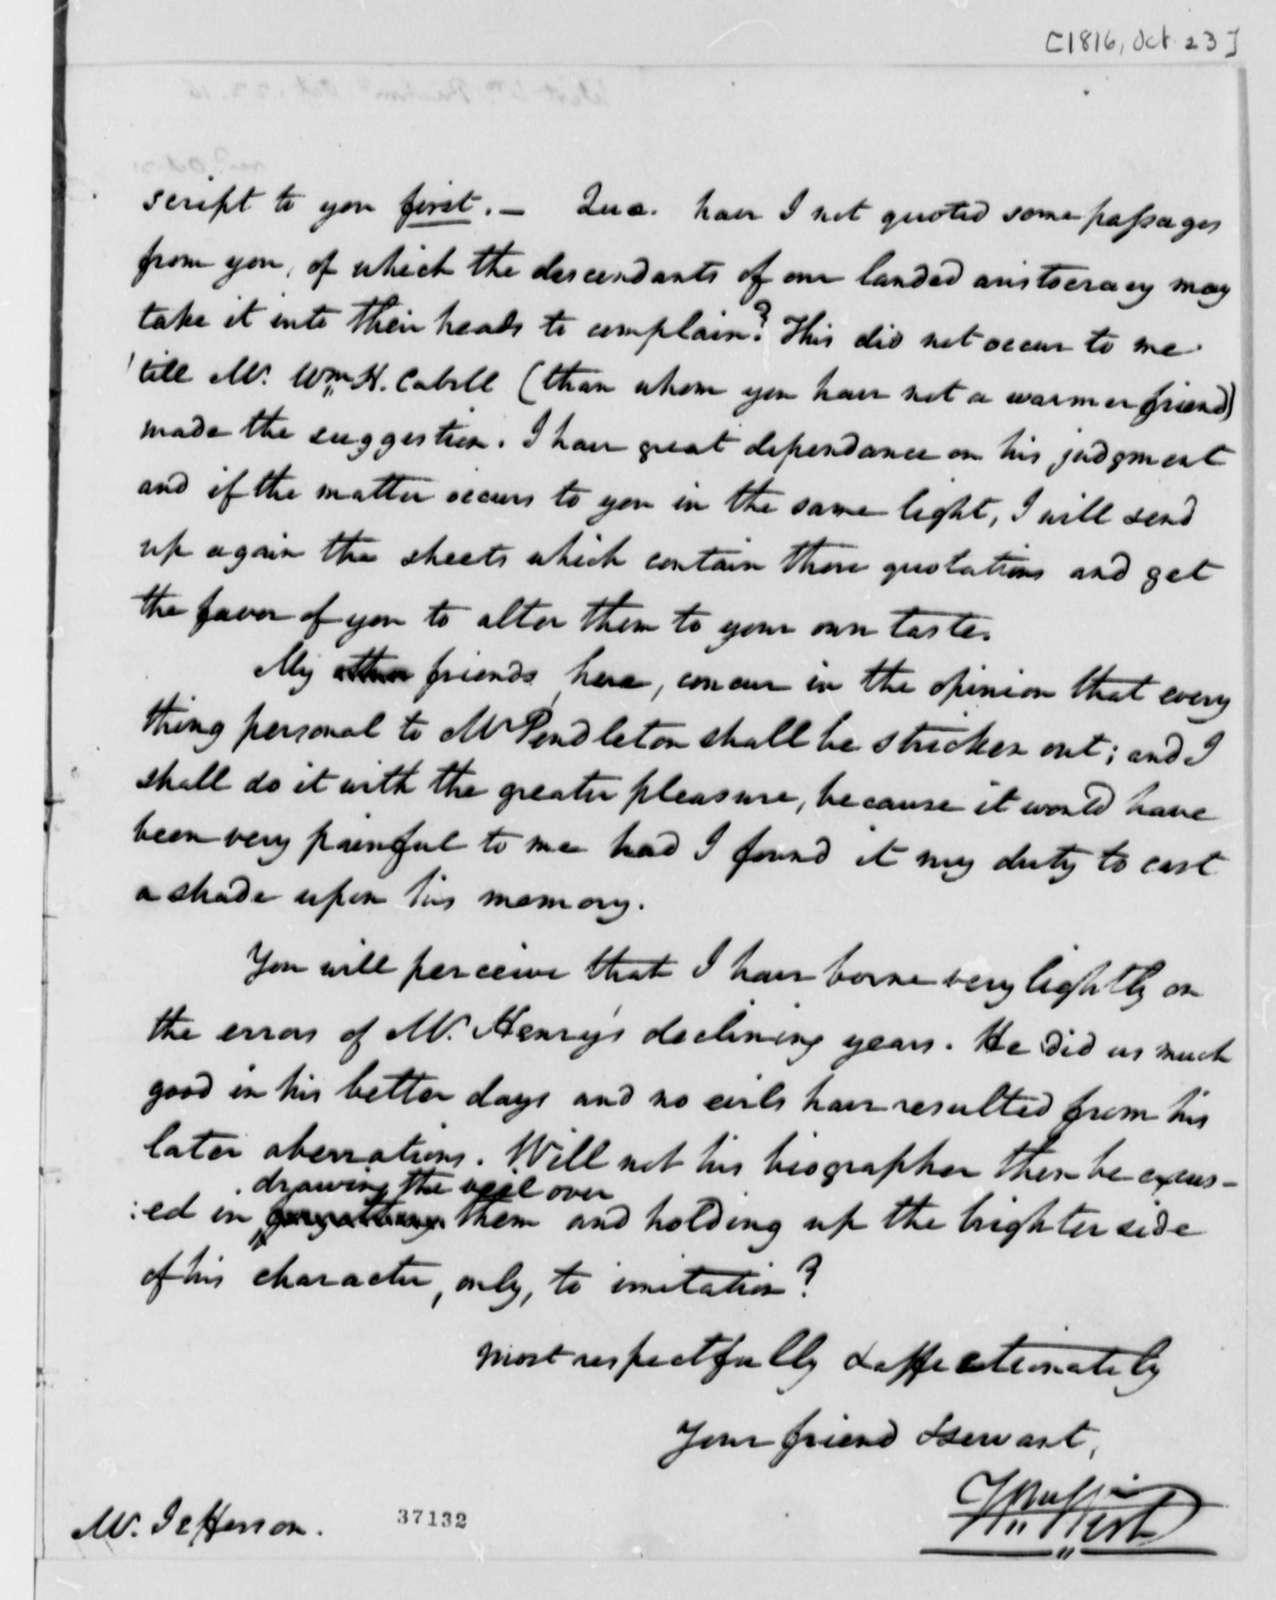 William Wirt to Thomas Jefferson, October 23, 1816